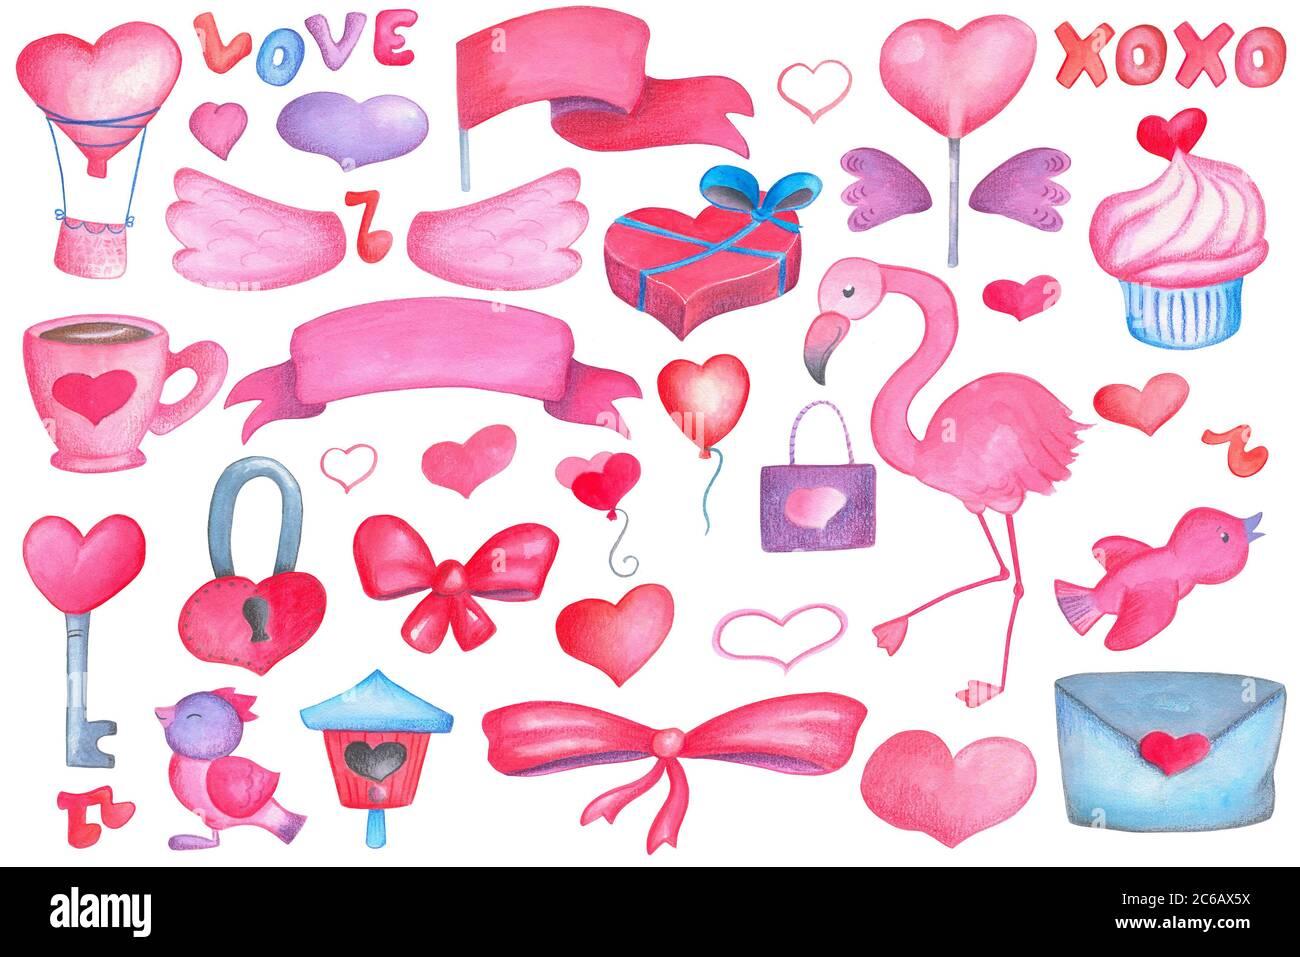 Clip Art Romantic Images Gallery - Romance Clip Art - Free Transparent PNG  Clipart Images Download